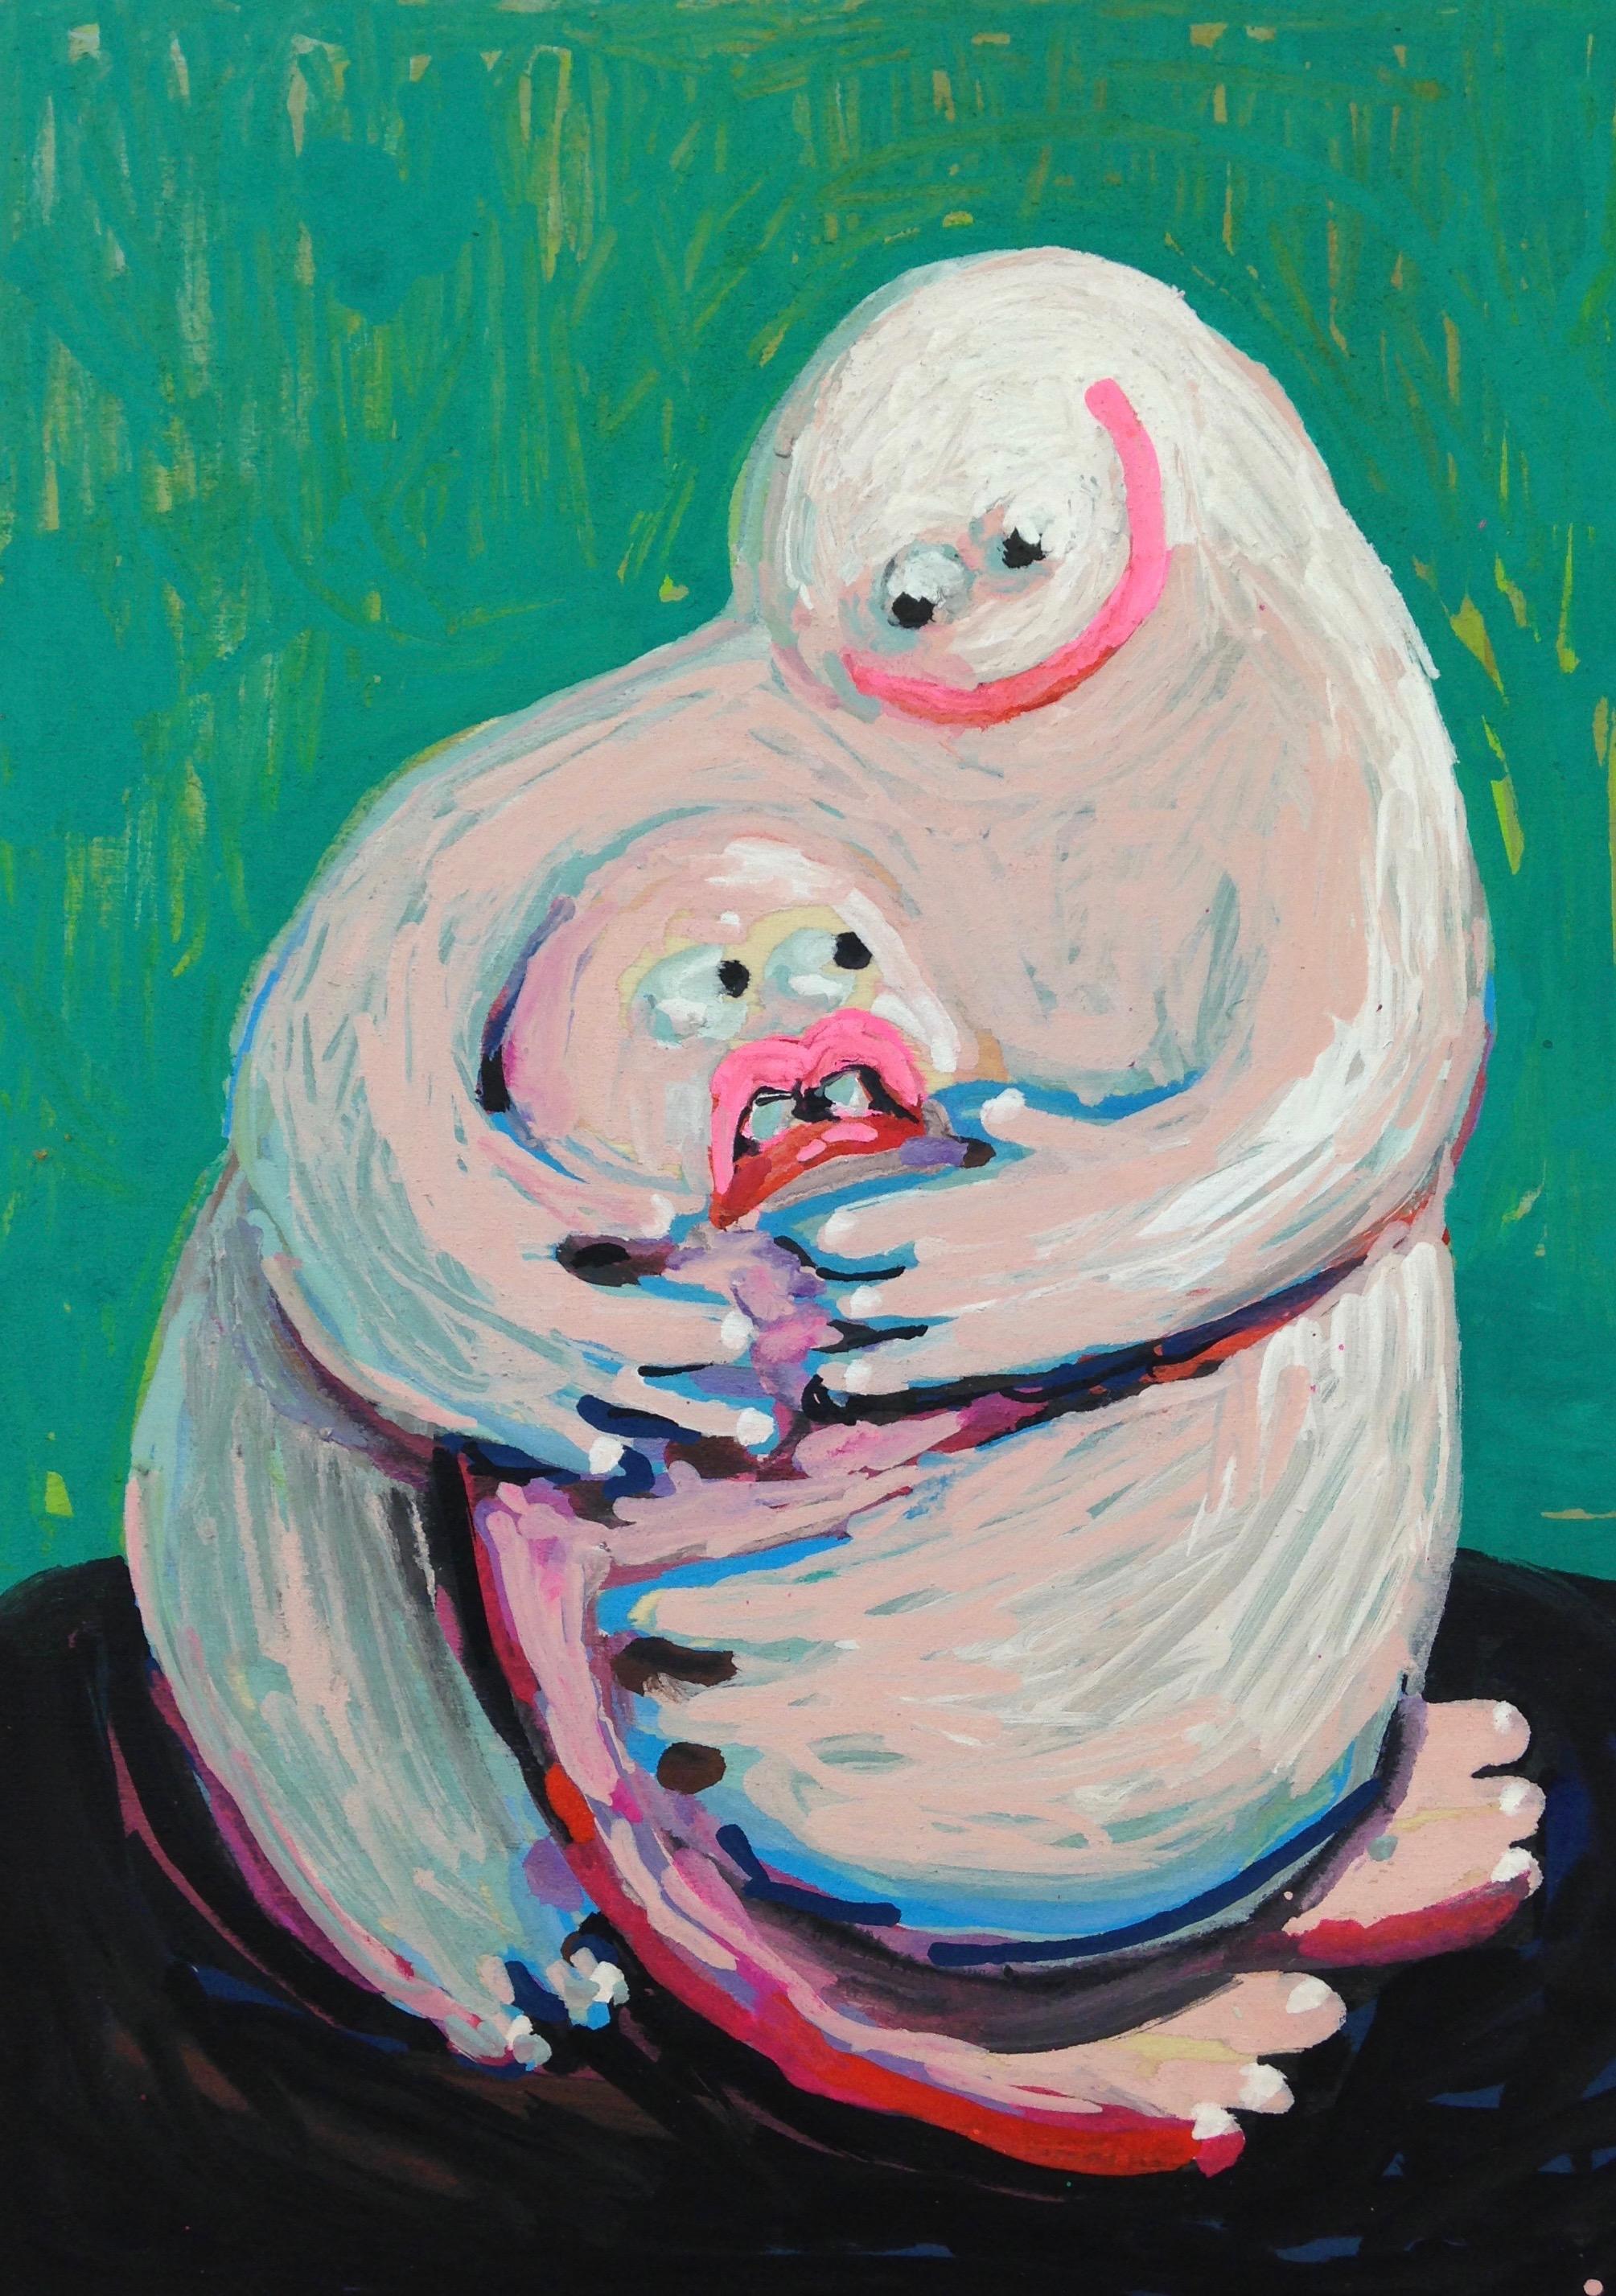 Claustrophobic Hug (Study)